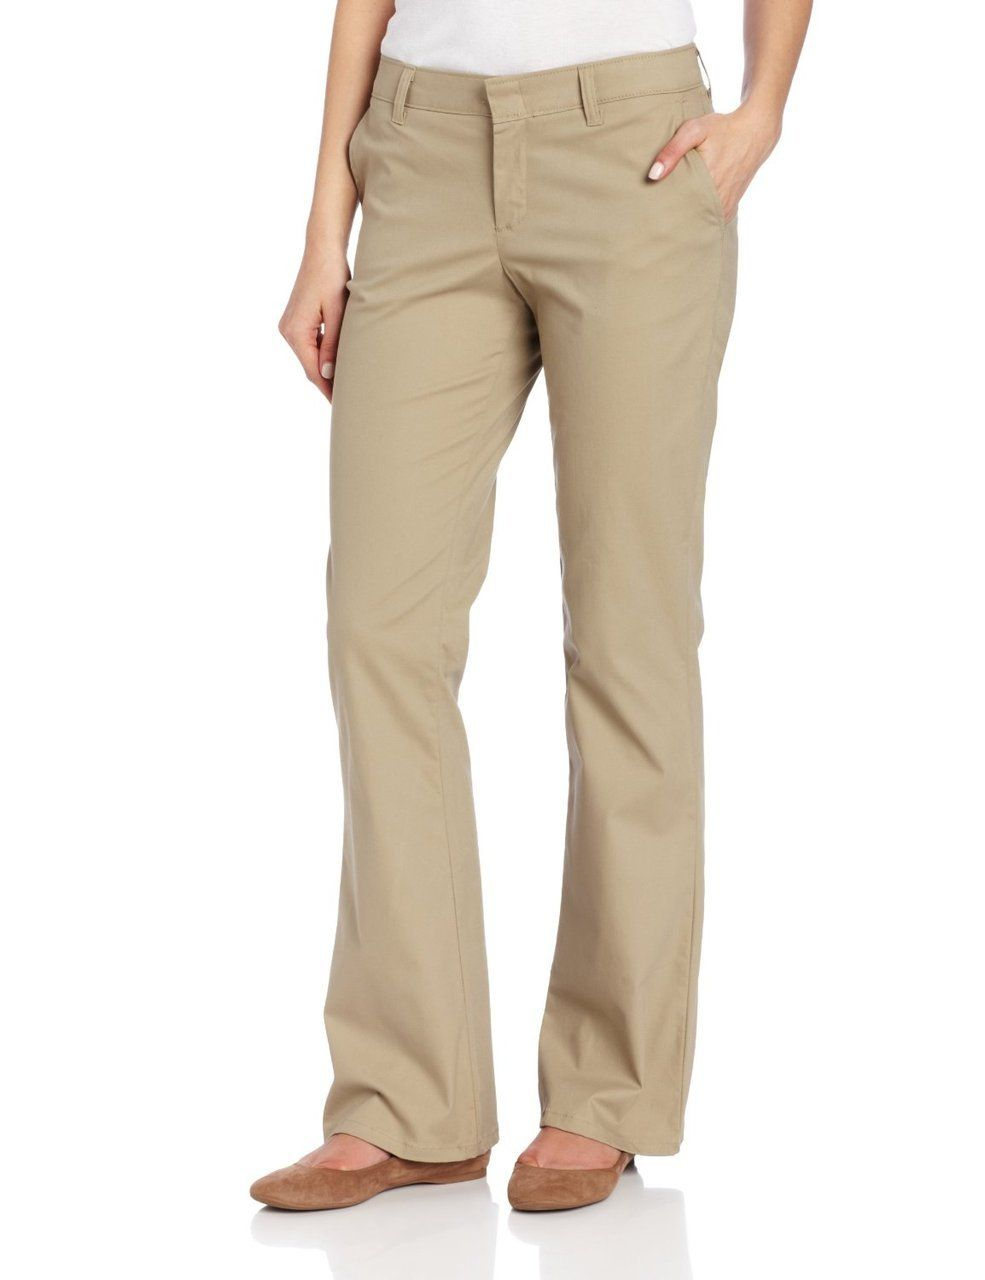 Dickies Fp121 Pantalones De Mujer Tipo Dockers Stretch 97 Algodon Pantalones Pantalones De Mujer Pantalon De Vestir Dama